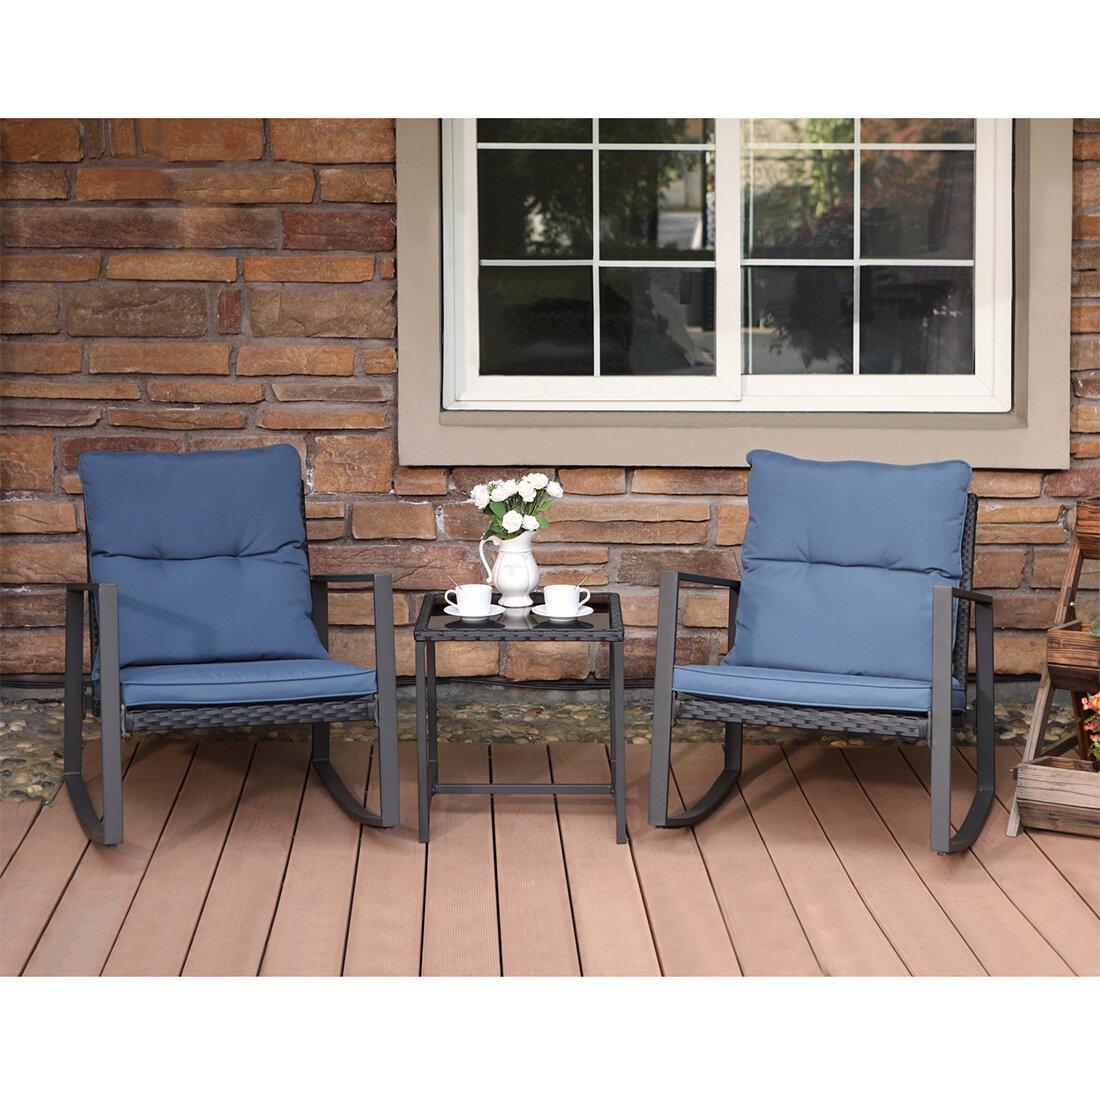 Outdoor Patio Furniture Rocking